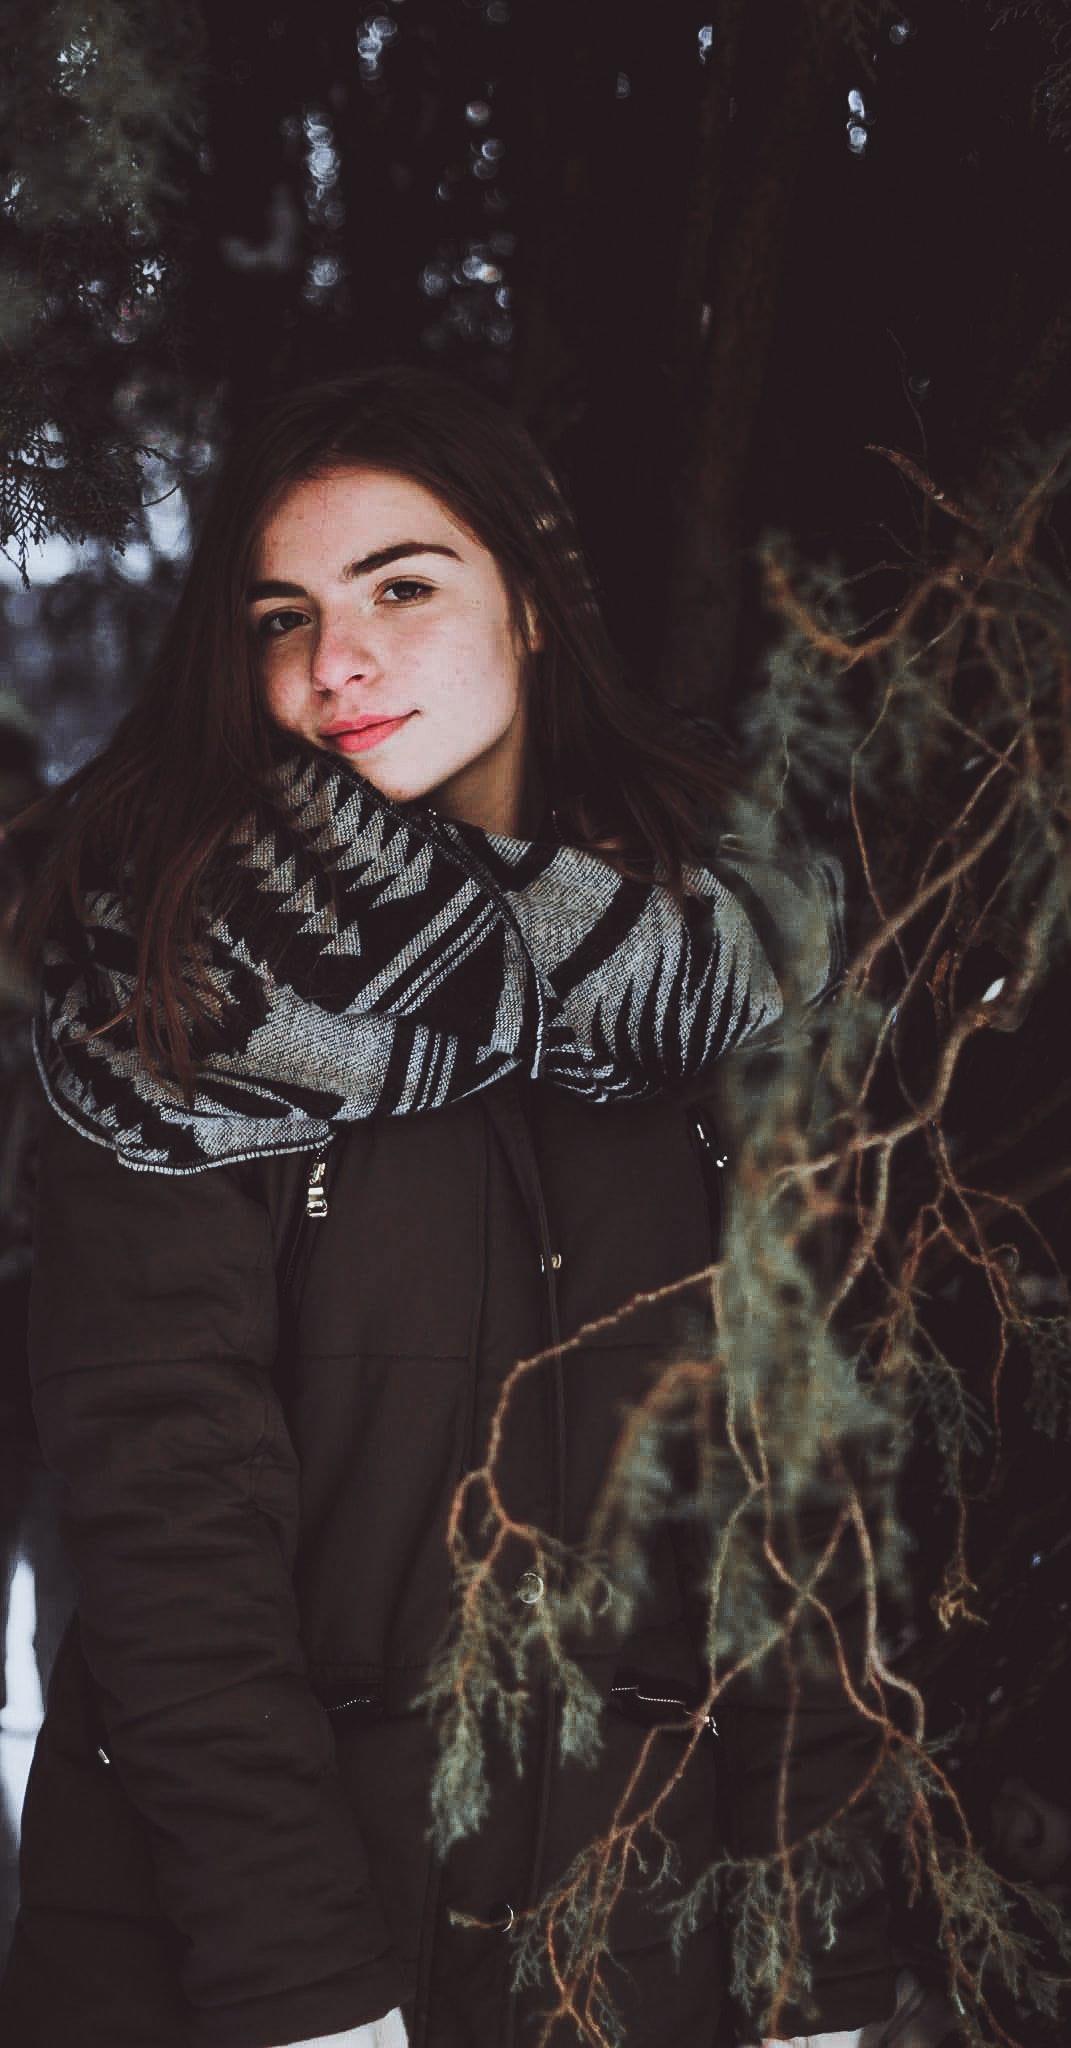 Woman Wearing Black Zip-up Jacket Posing Under Tree, Beautiful, Person, Woman, Winter, HQ Photo